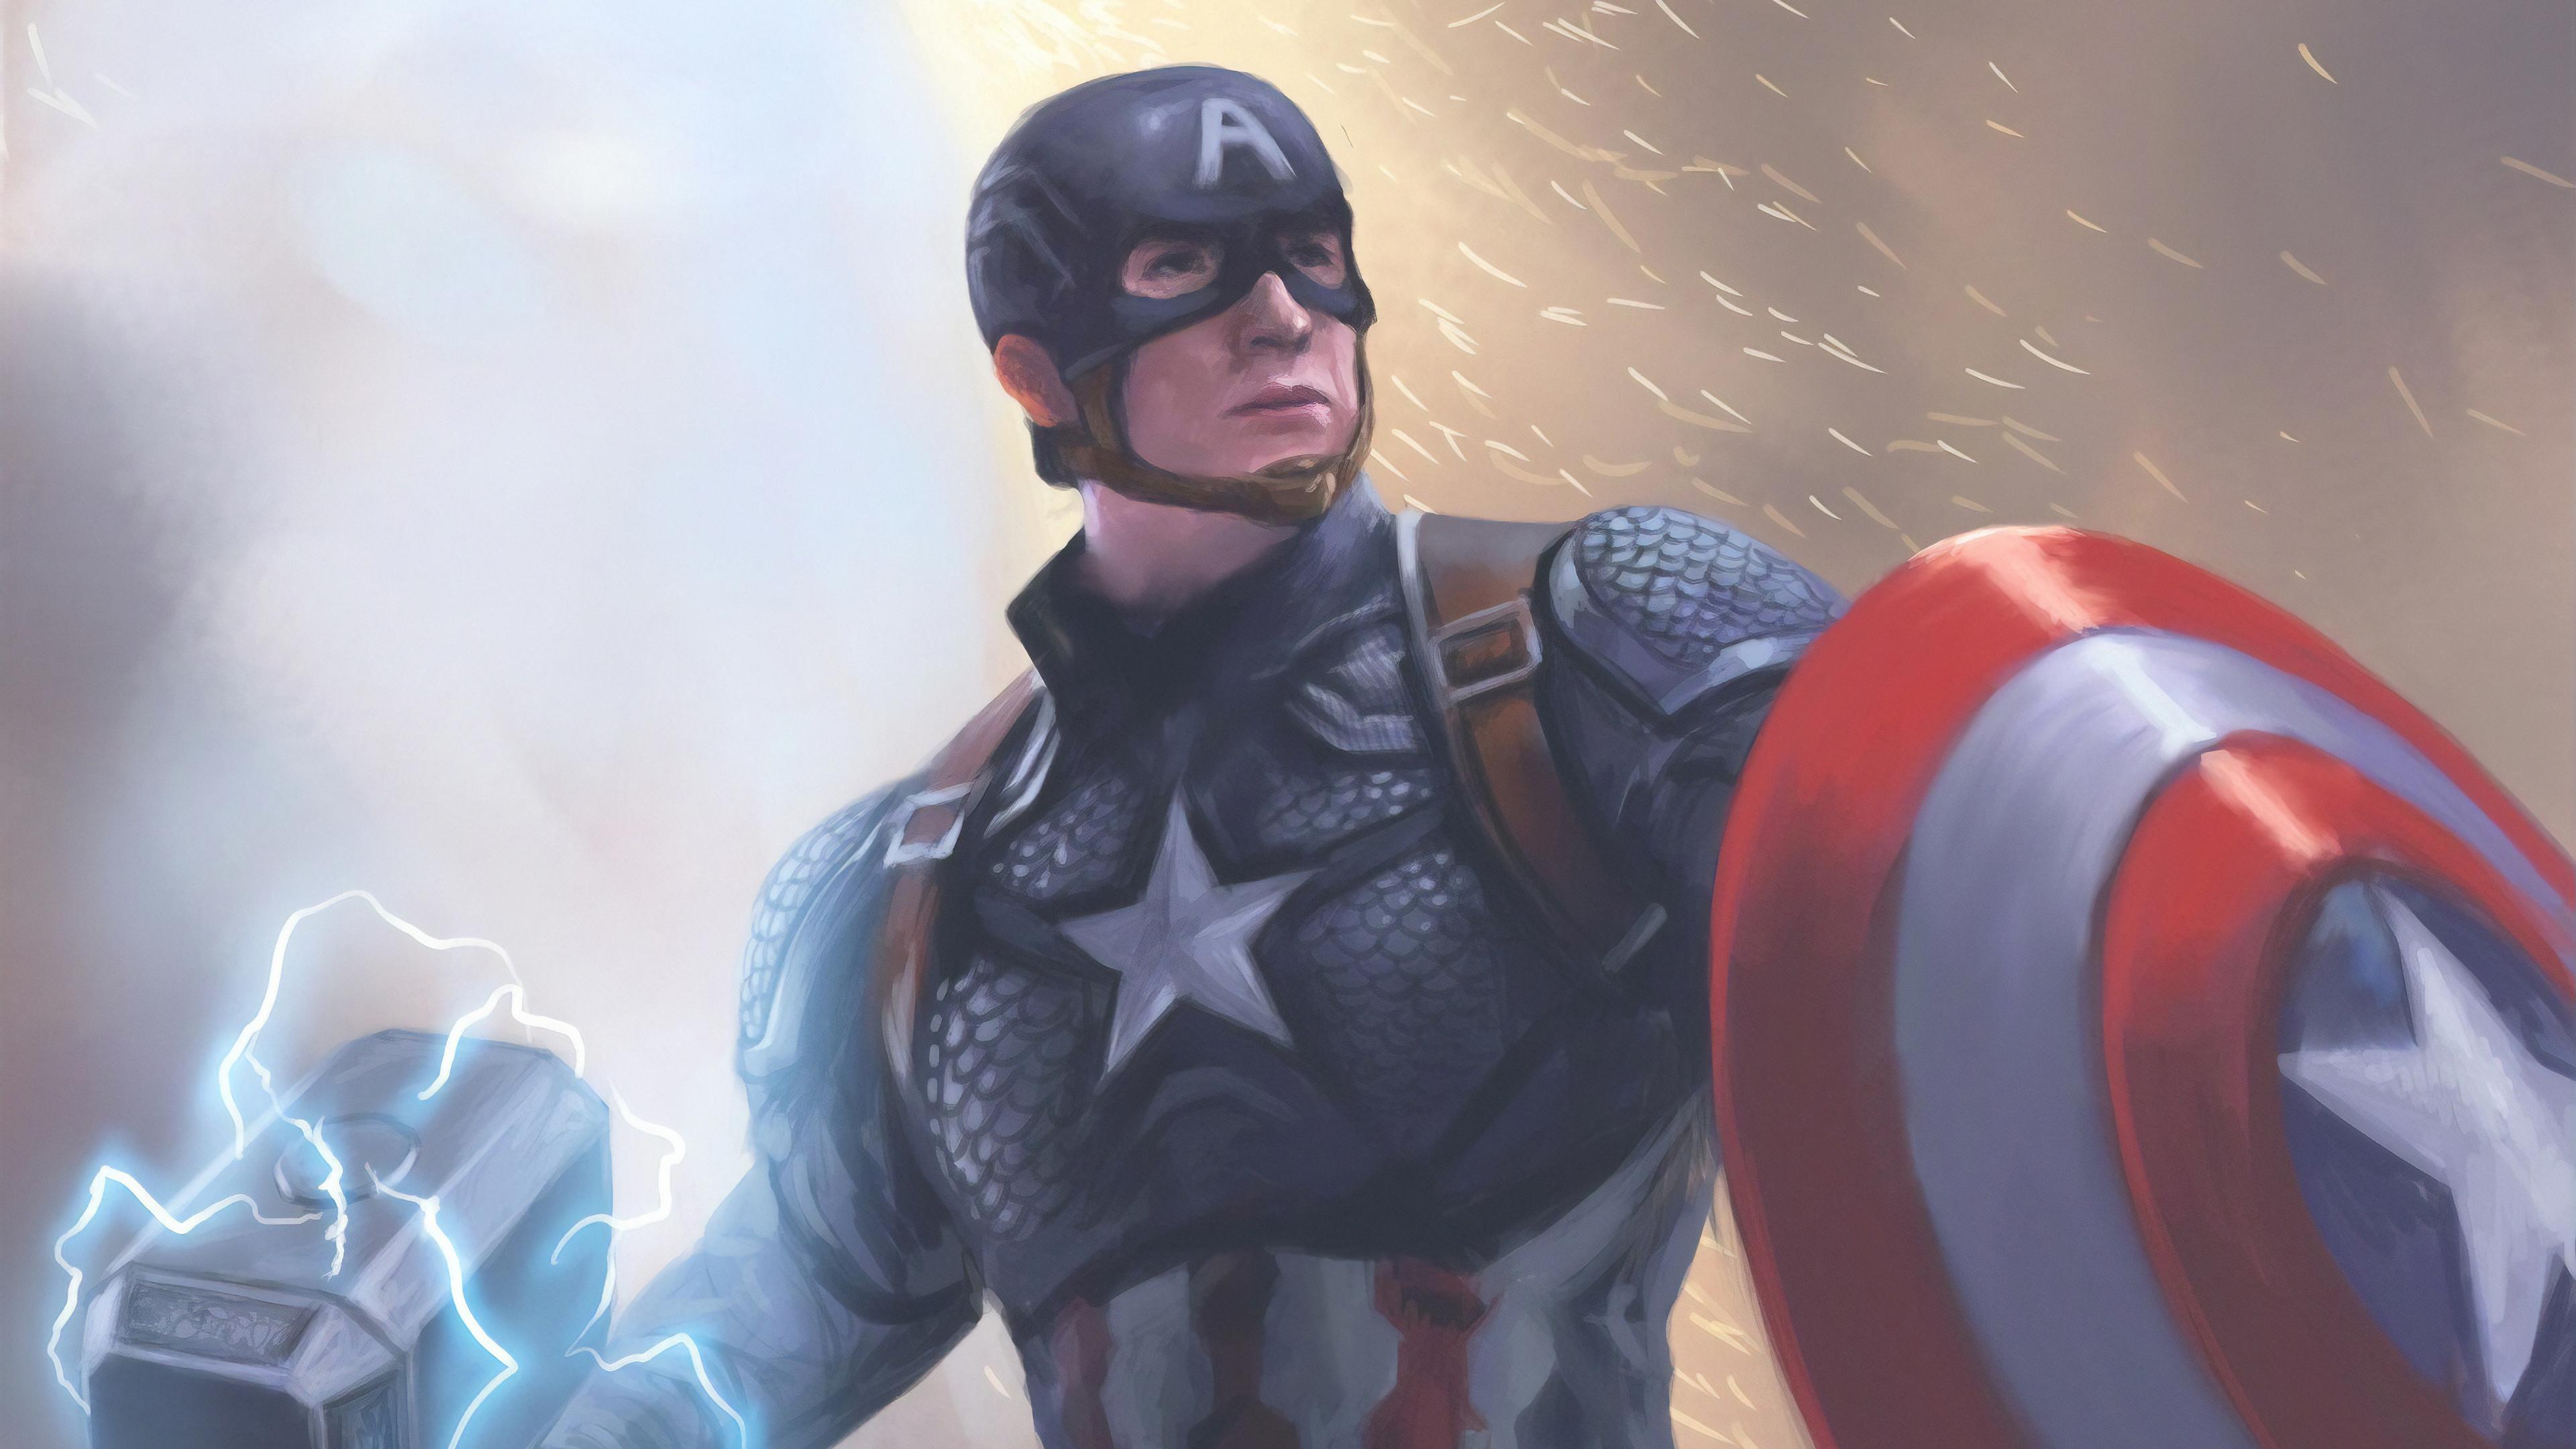 captain america shield hammer 1572368679 - Captain America Shield Hammer - superheroes wallpapers, hd-wallpapers, captain america wallpapers, artwork wallpapers, 4k-wallpapers